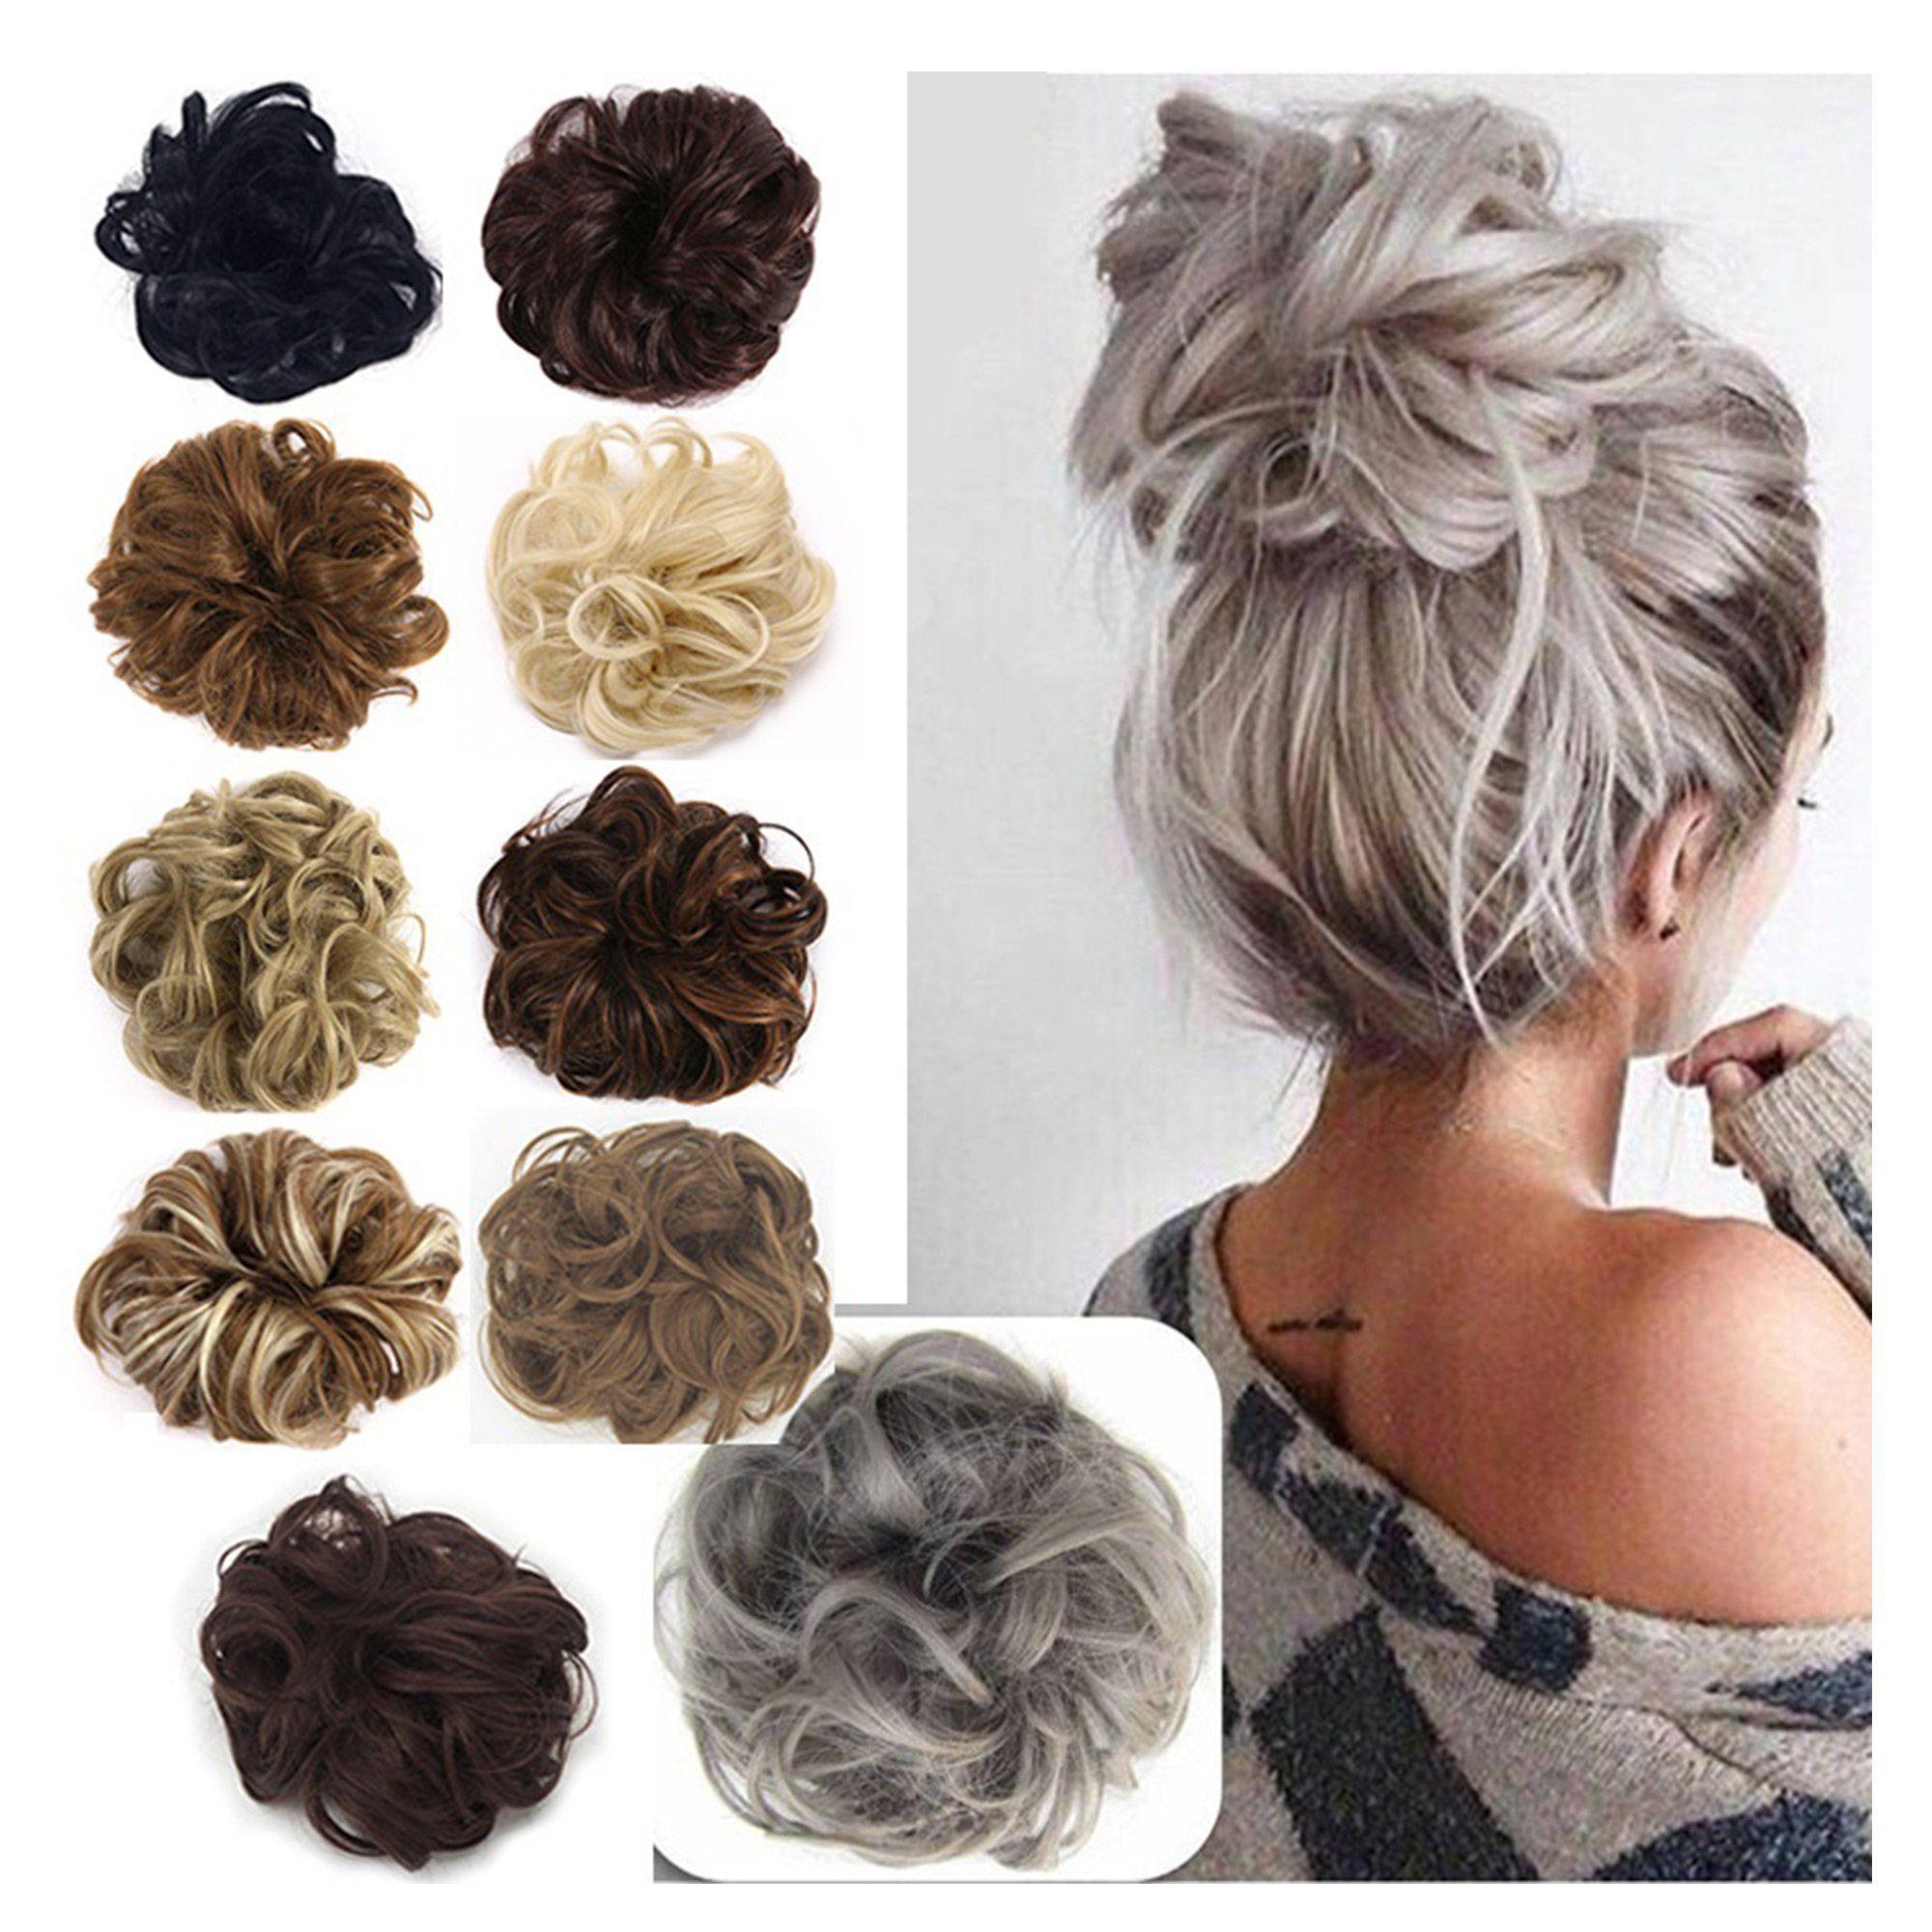 Florata Messy Hair Bun Chignon Updo Clip In Extension Walmart Com In 2020 Messy Bun Hairstyles Chignon Hair Messy Hairstyles